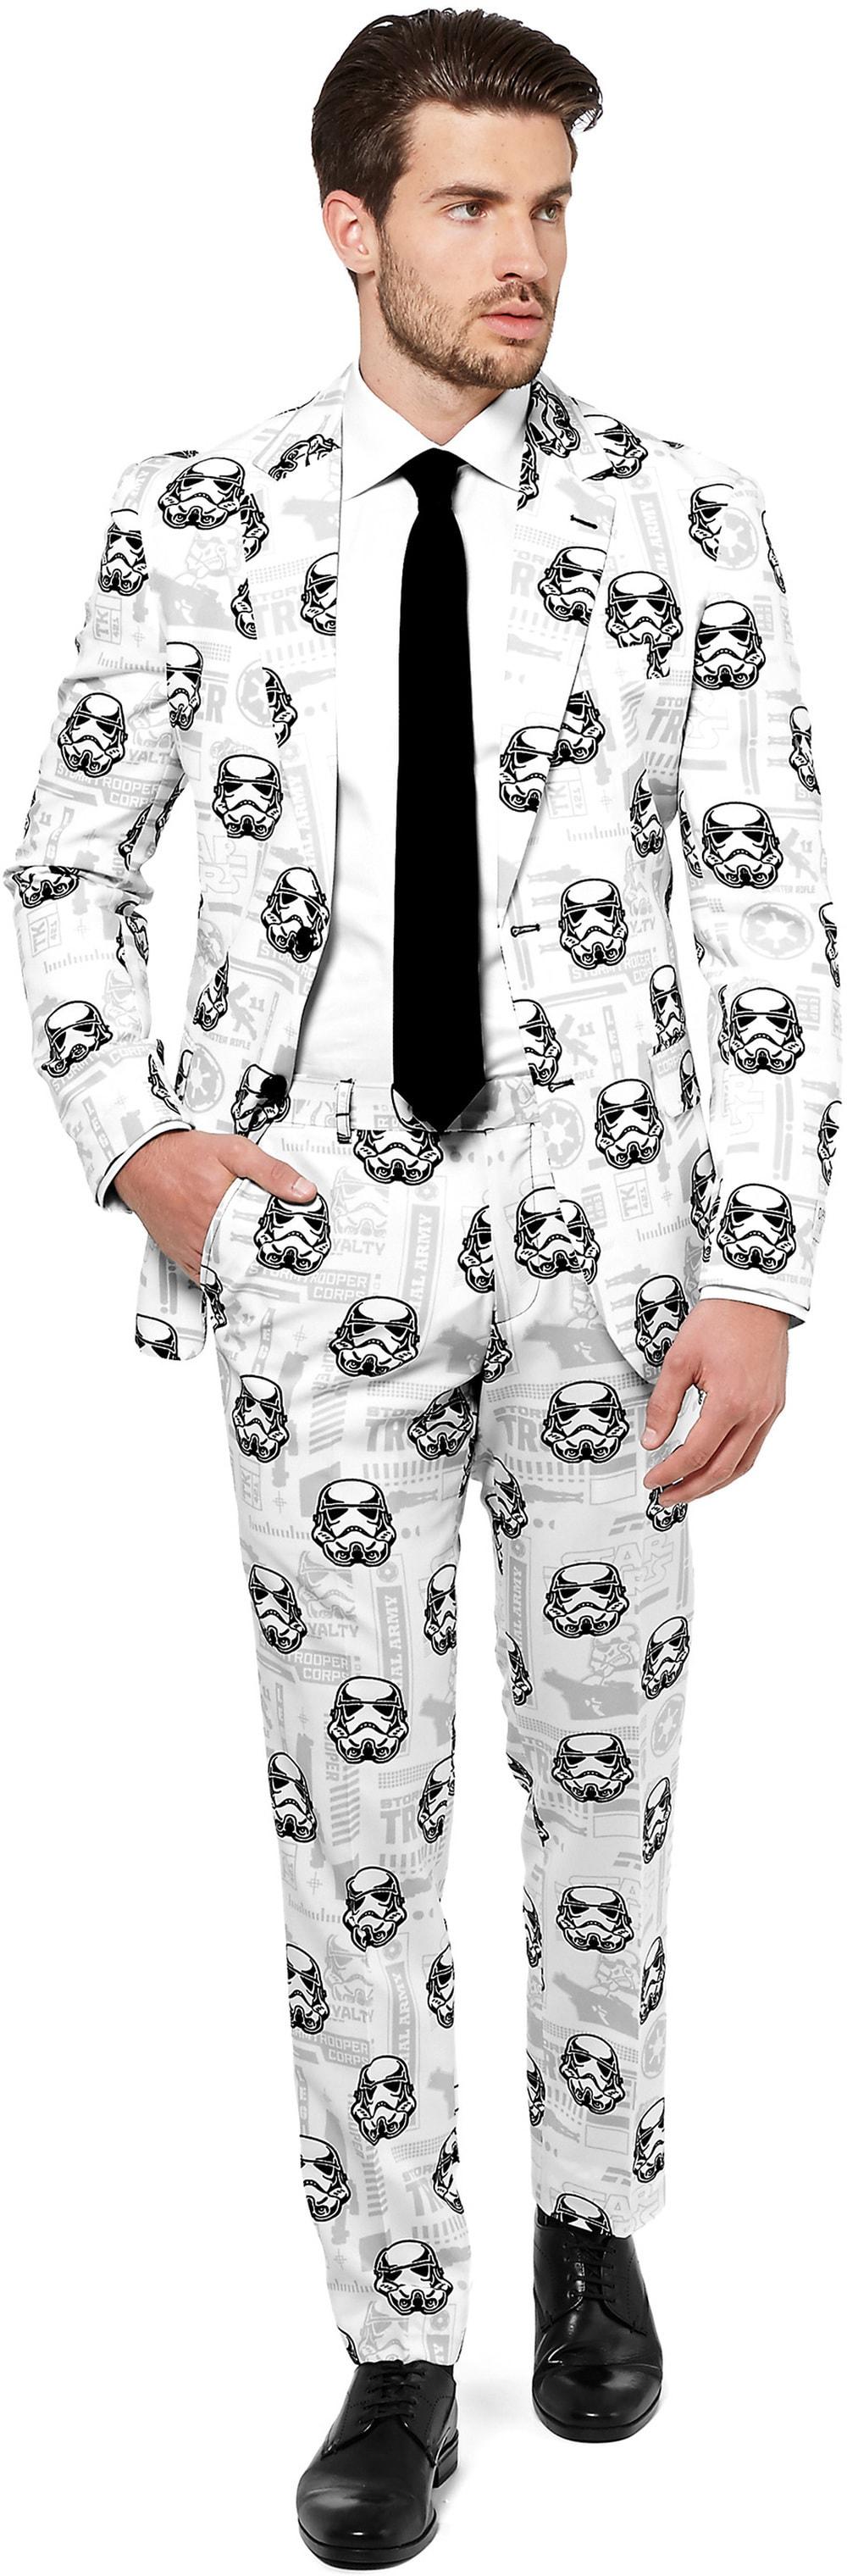 OppoSuits Stormtrooper Kostuum foto 0